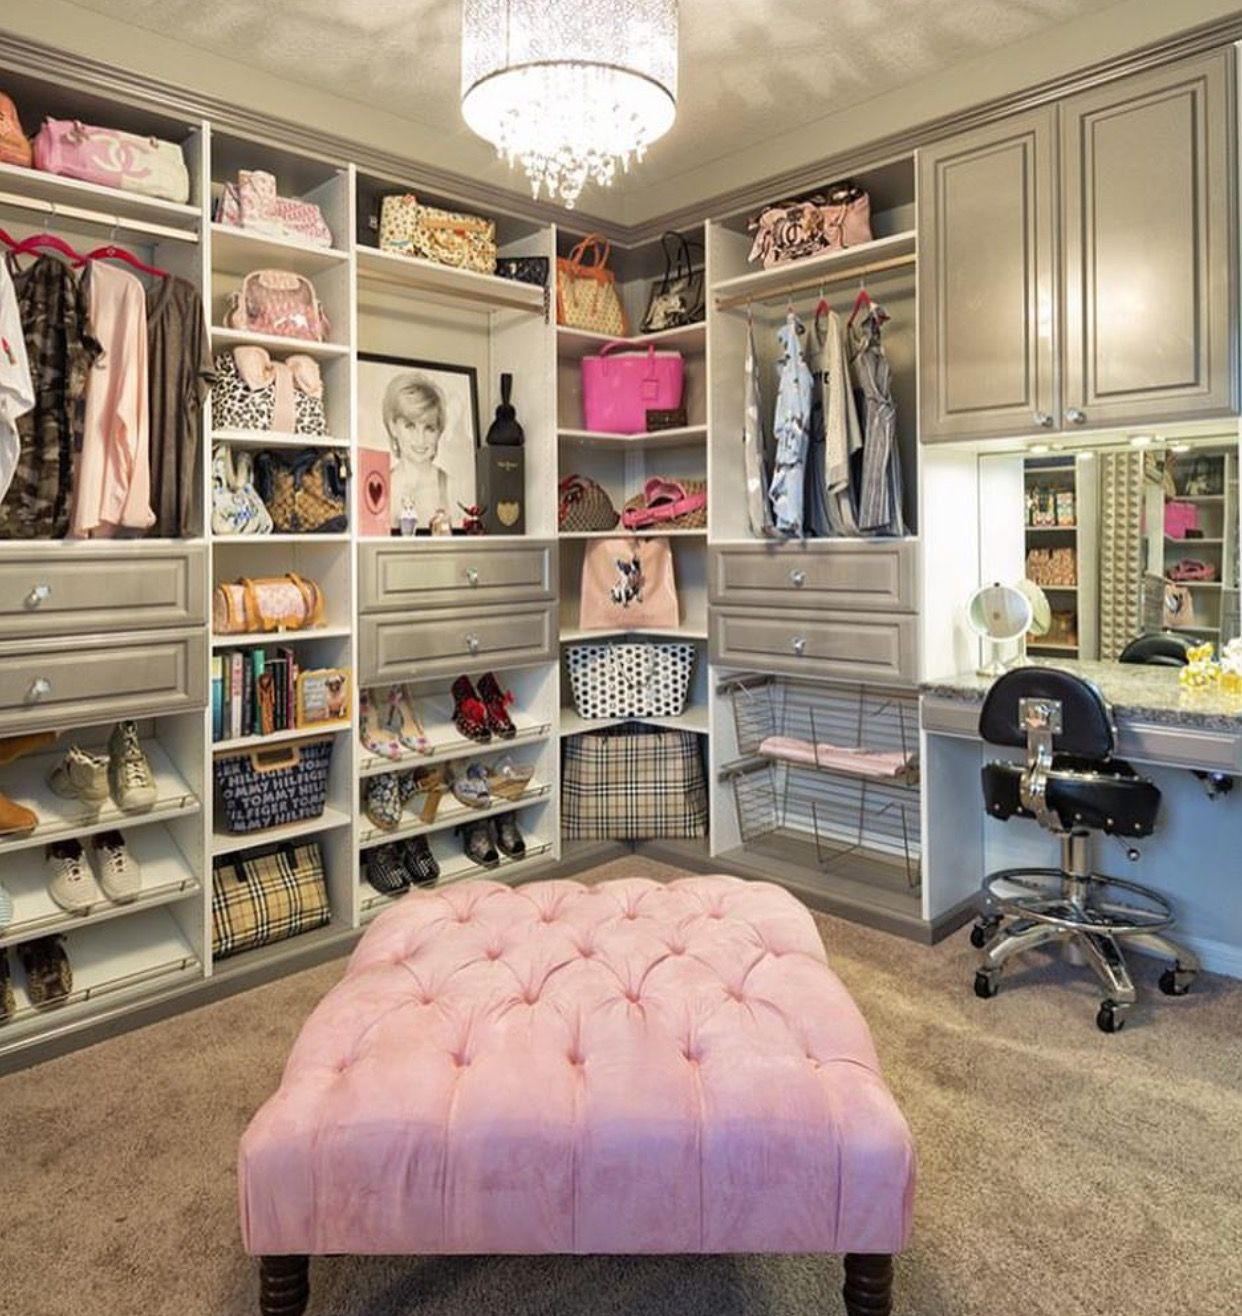 pin by julia debelly on home decor pinterest closet bedroom rh pinterest com